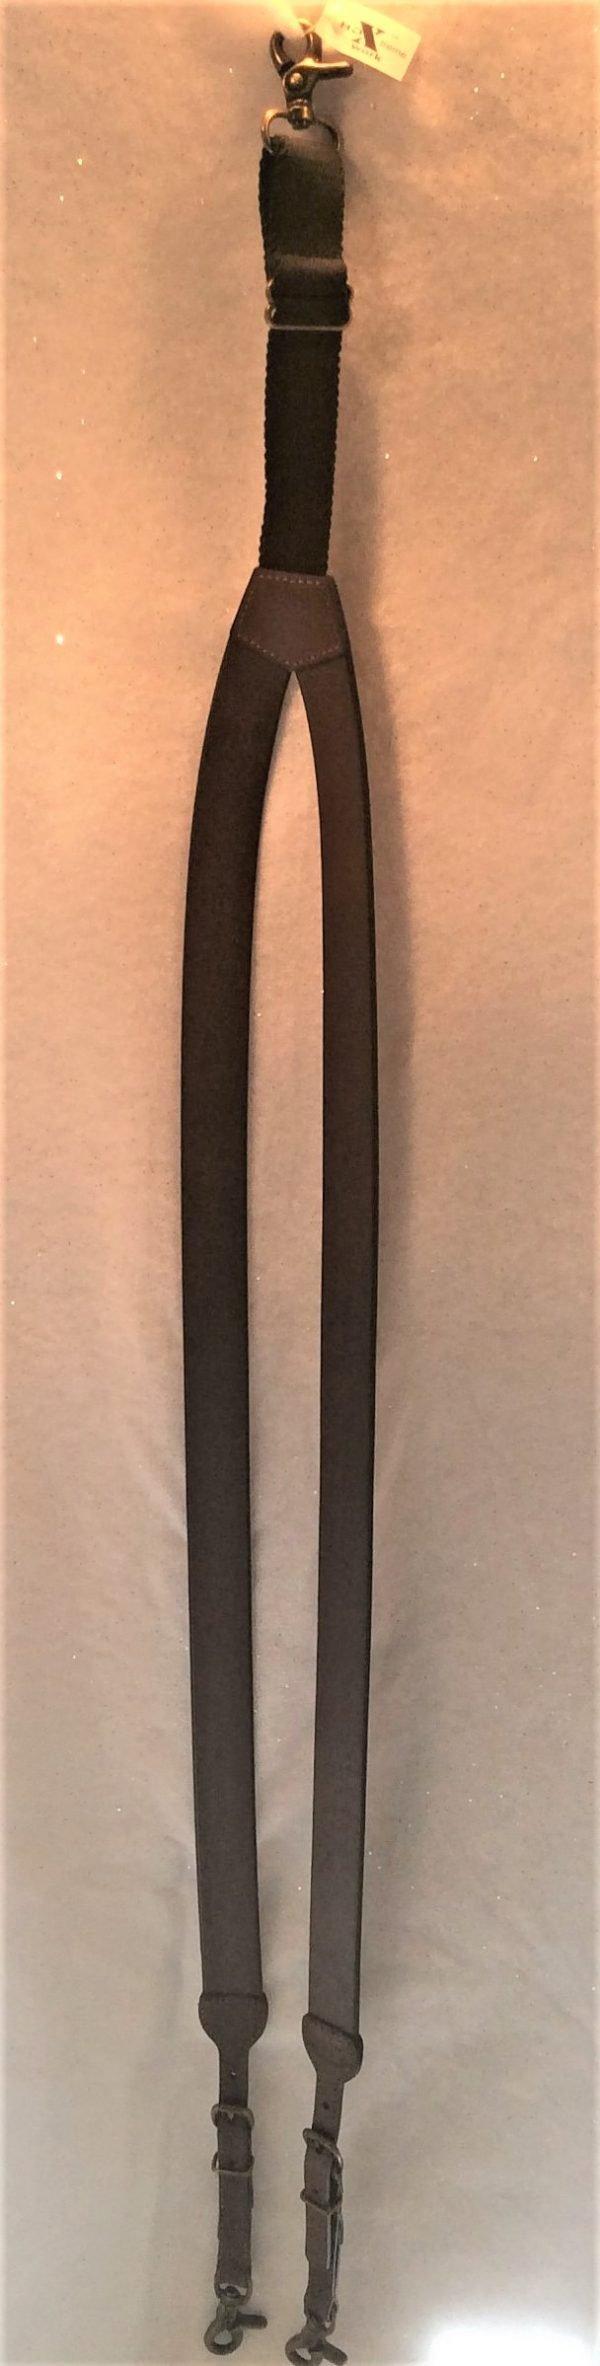 HDXtreme Work Brown Suspenders